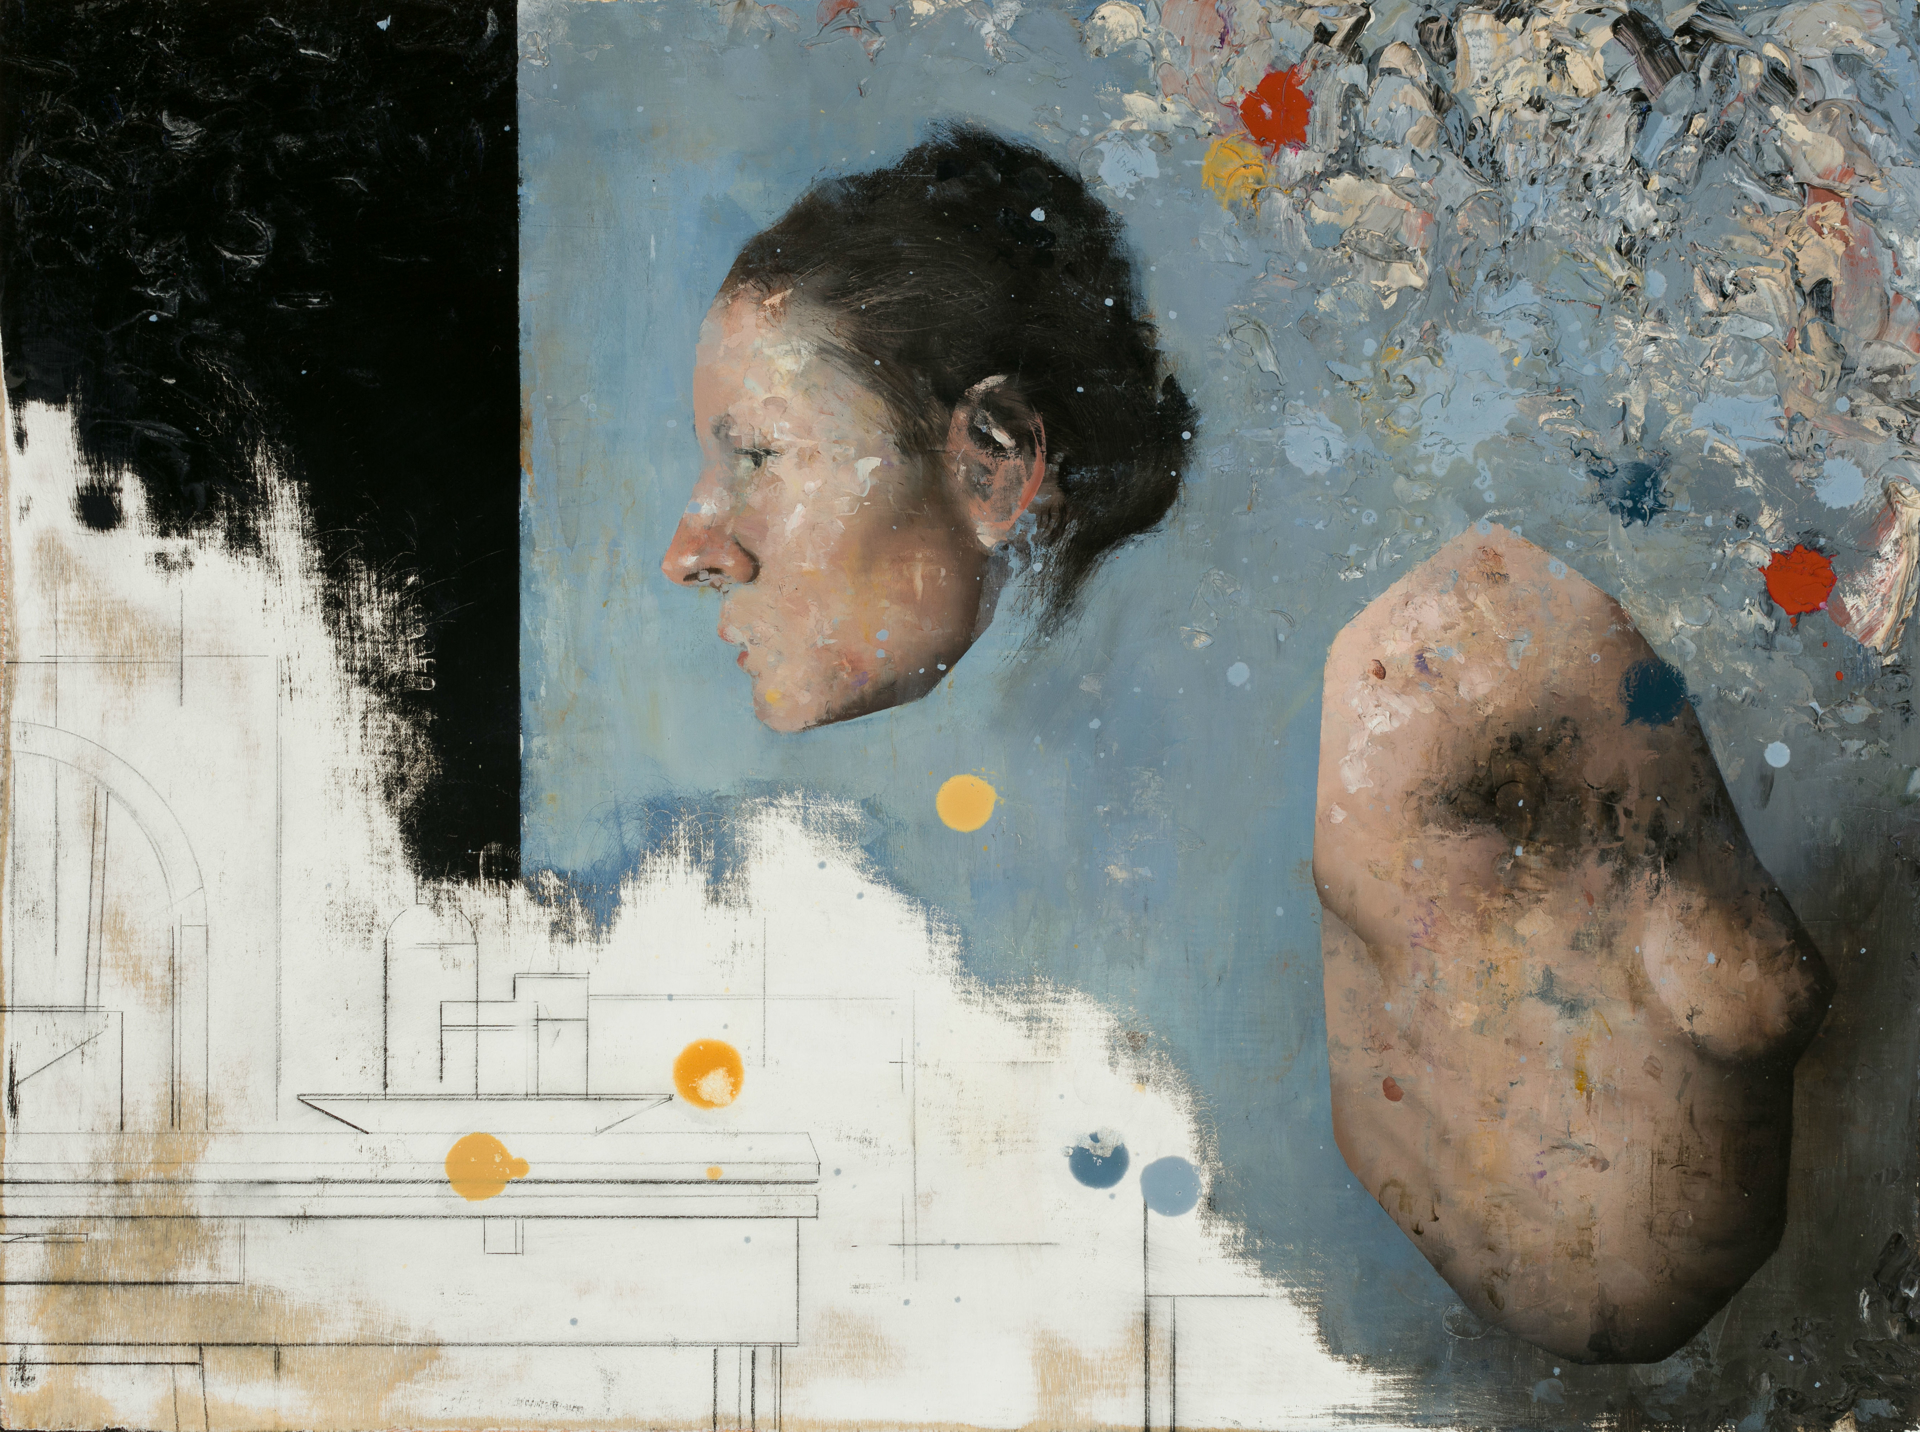 Domestica by Matthew Saba